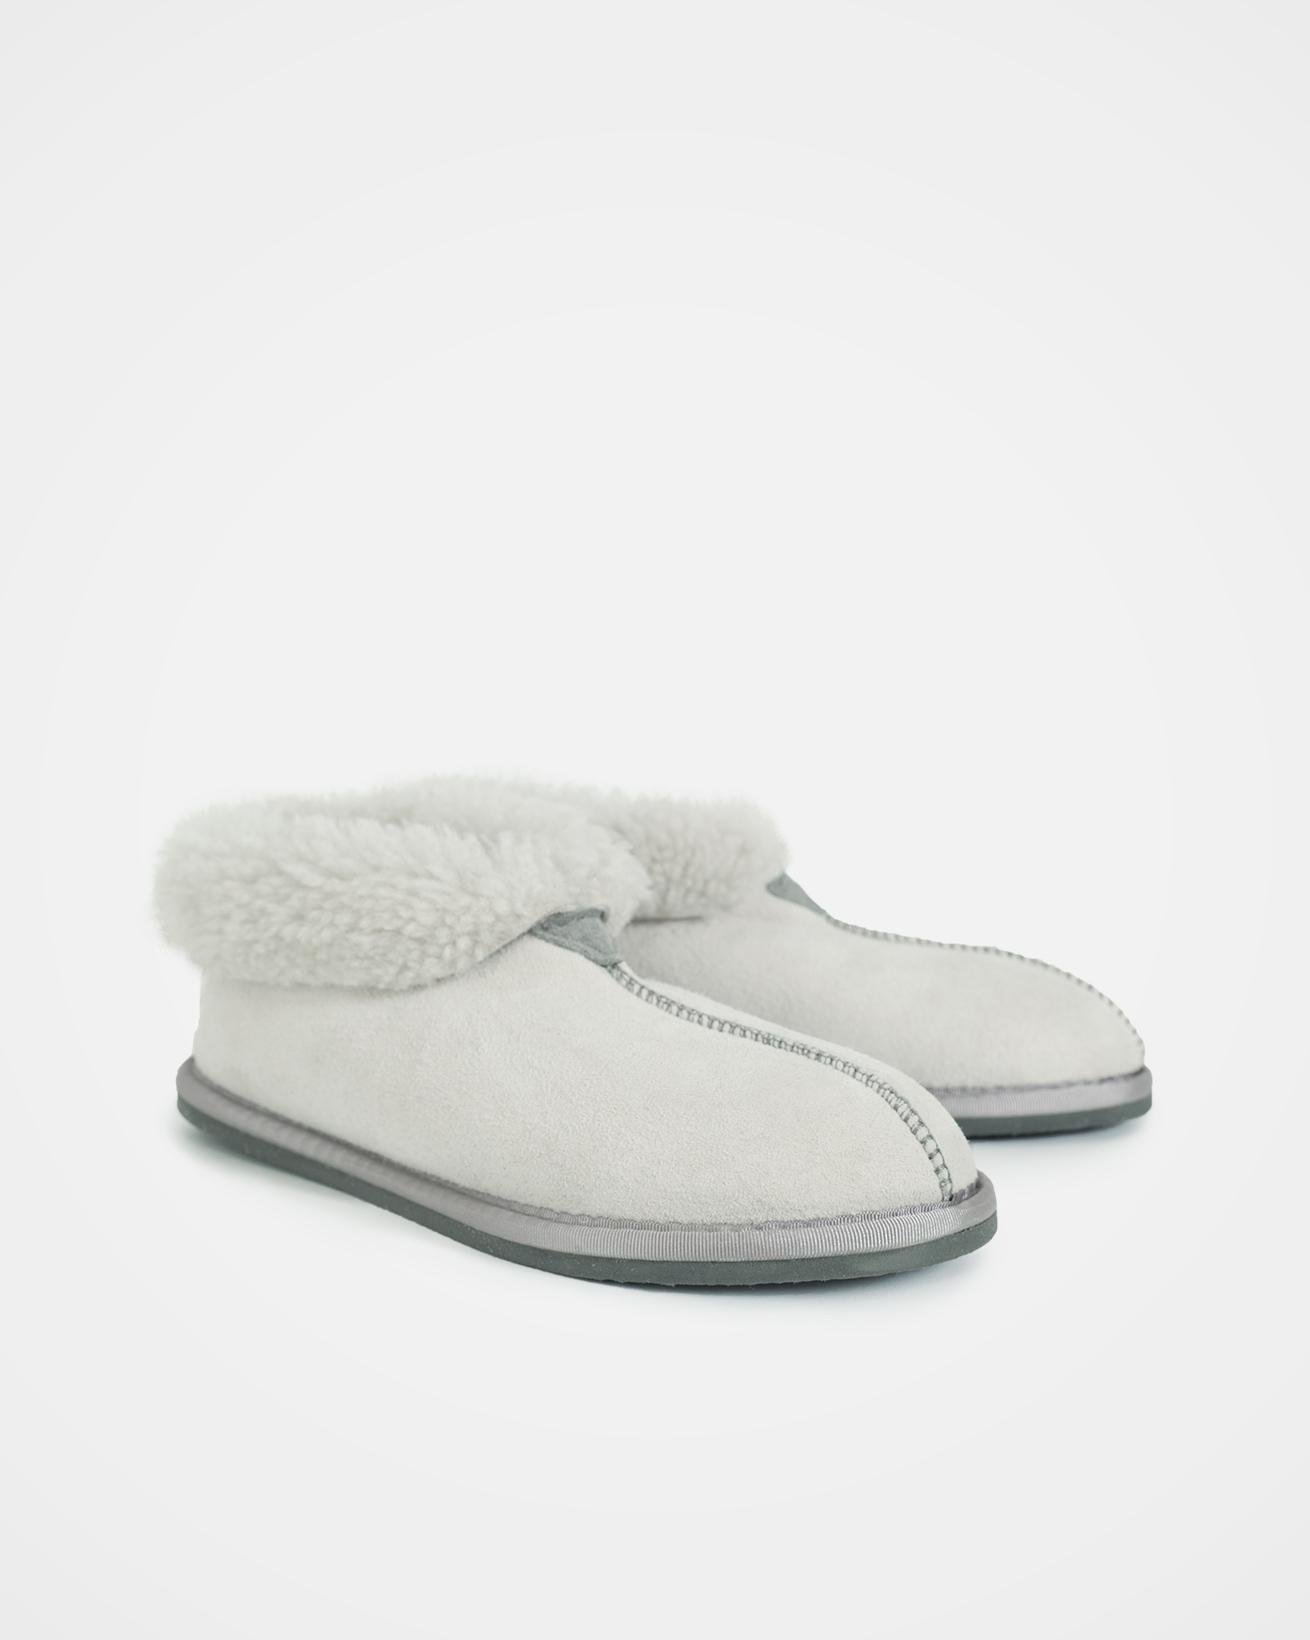 Ladies Sheepskin Bootee Slipper - Size 7 - Winter White - 1578